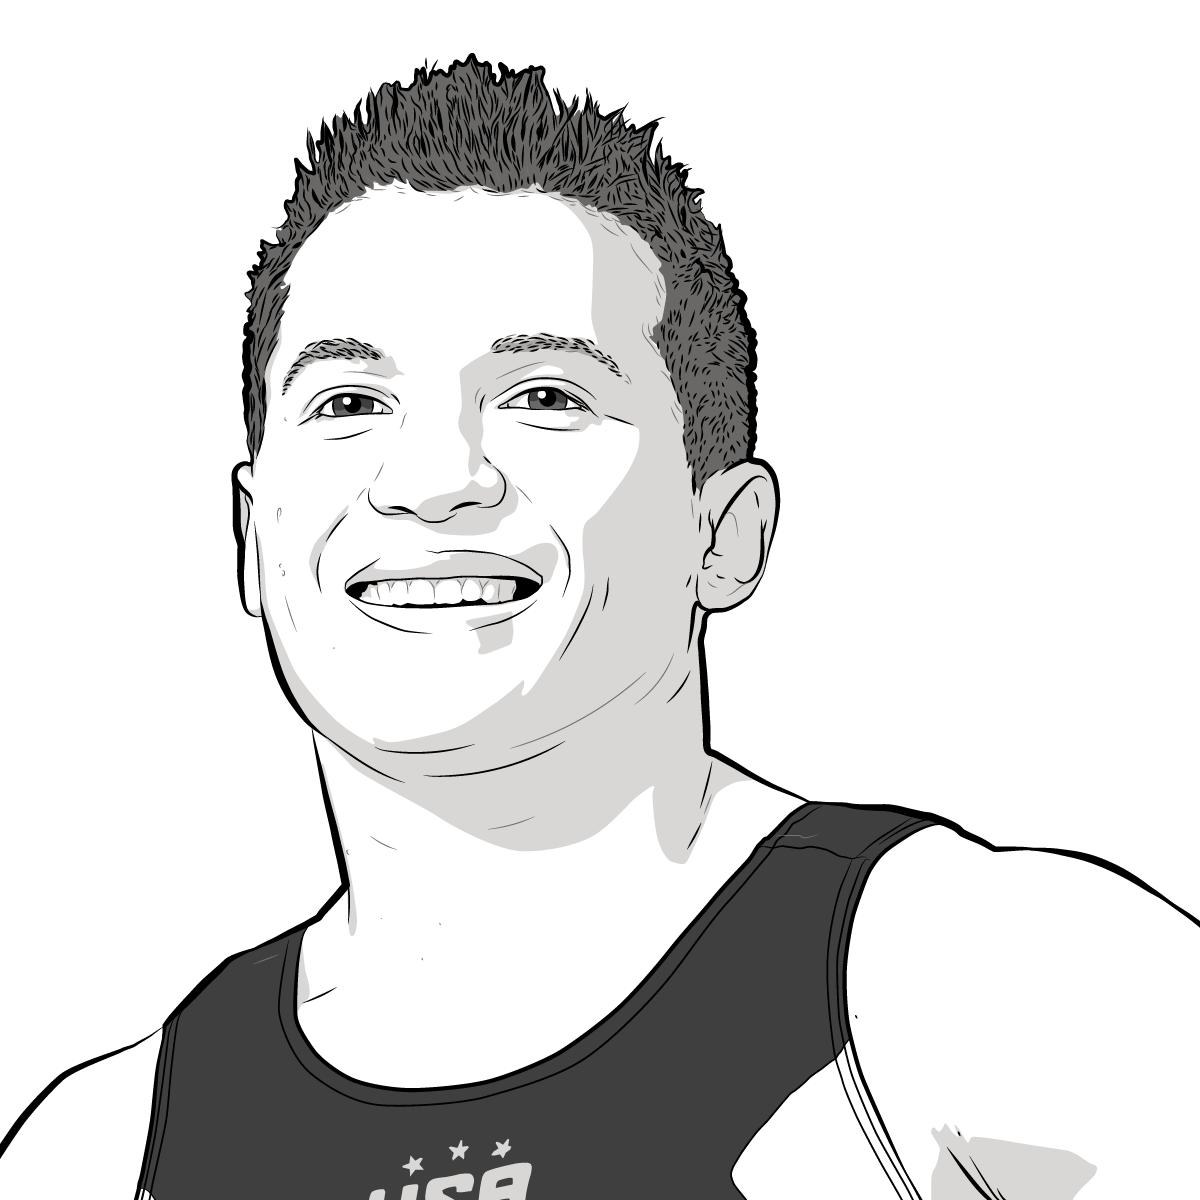 Athlete Portrait of Jonathan Horton, Illustration by Max Hancock